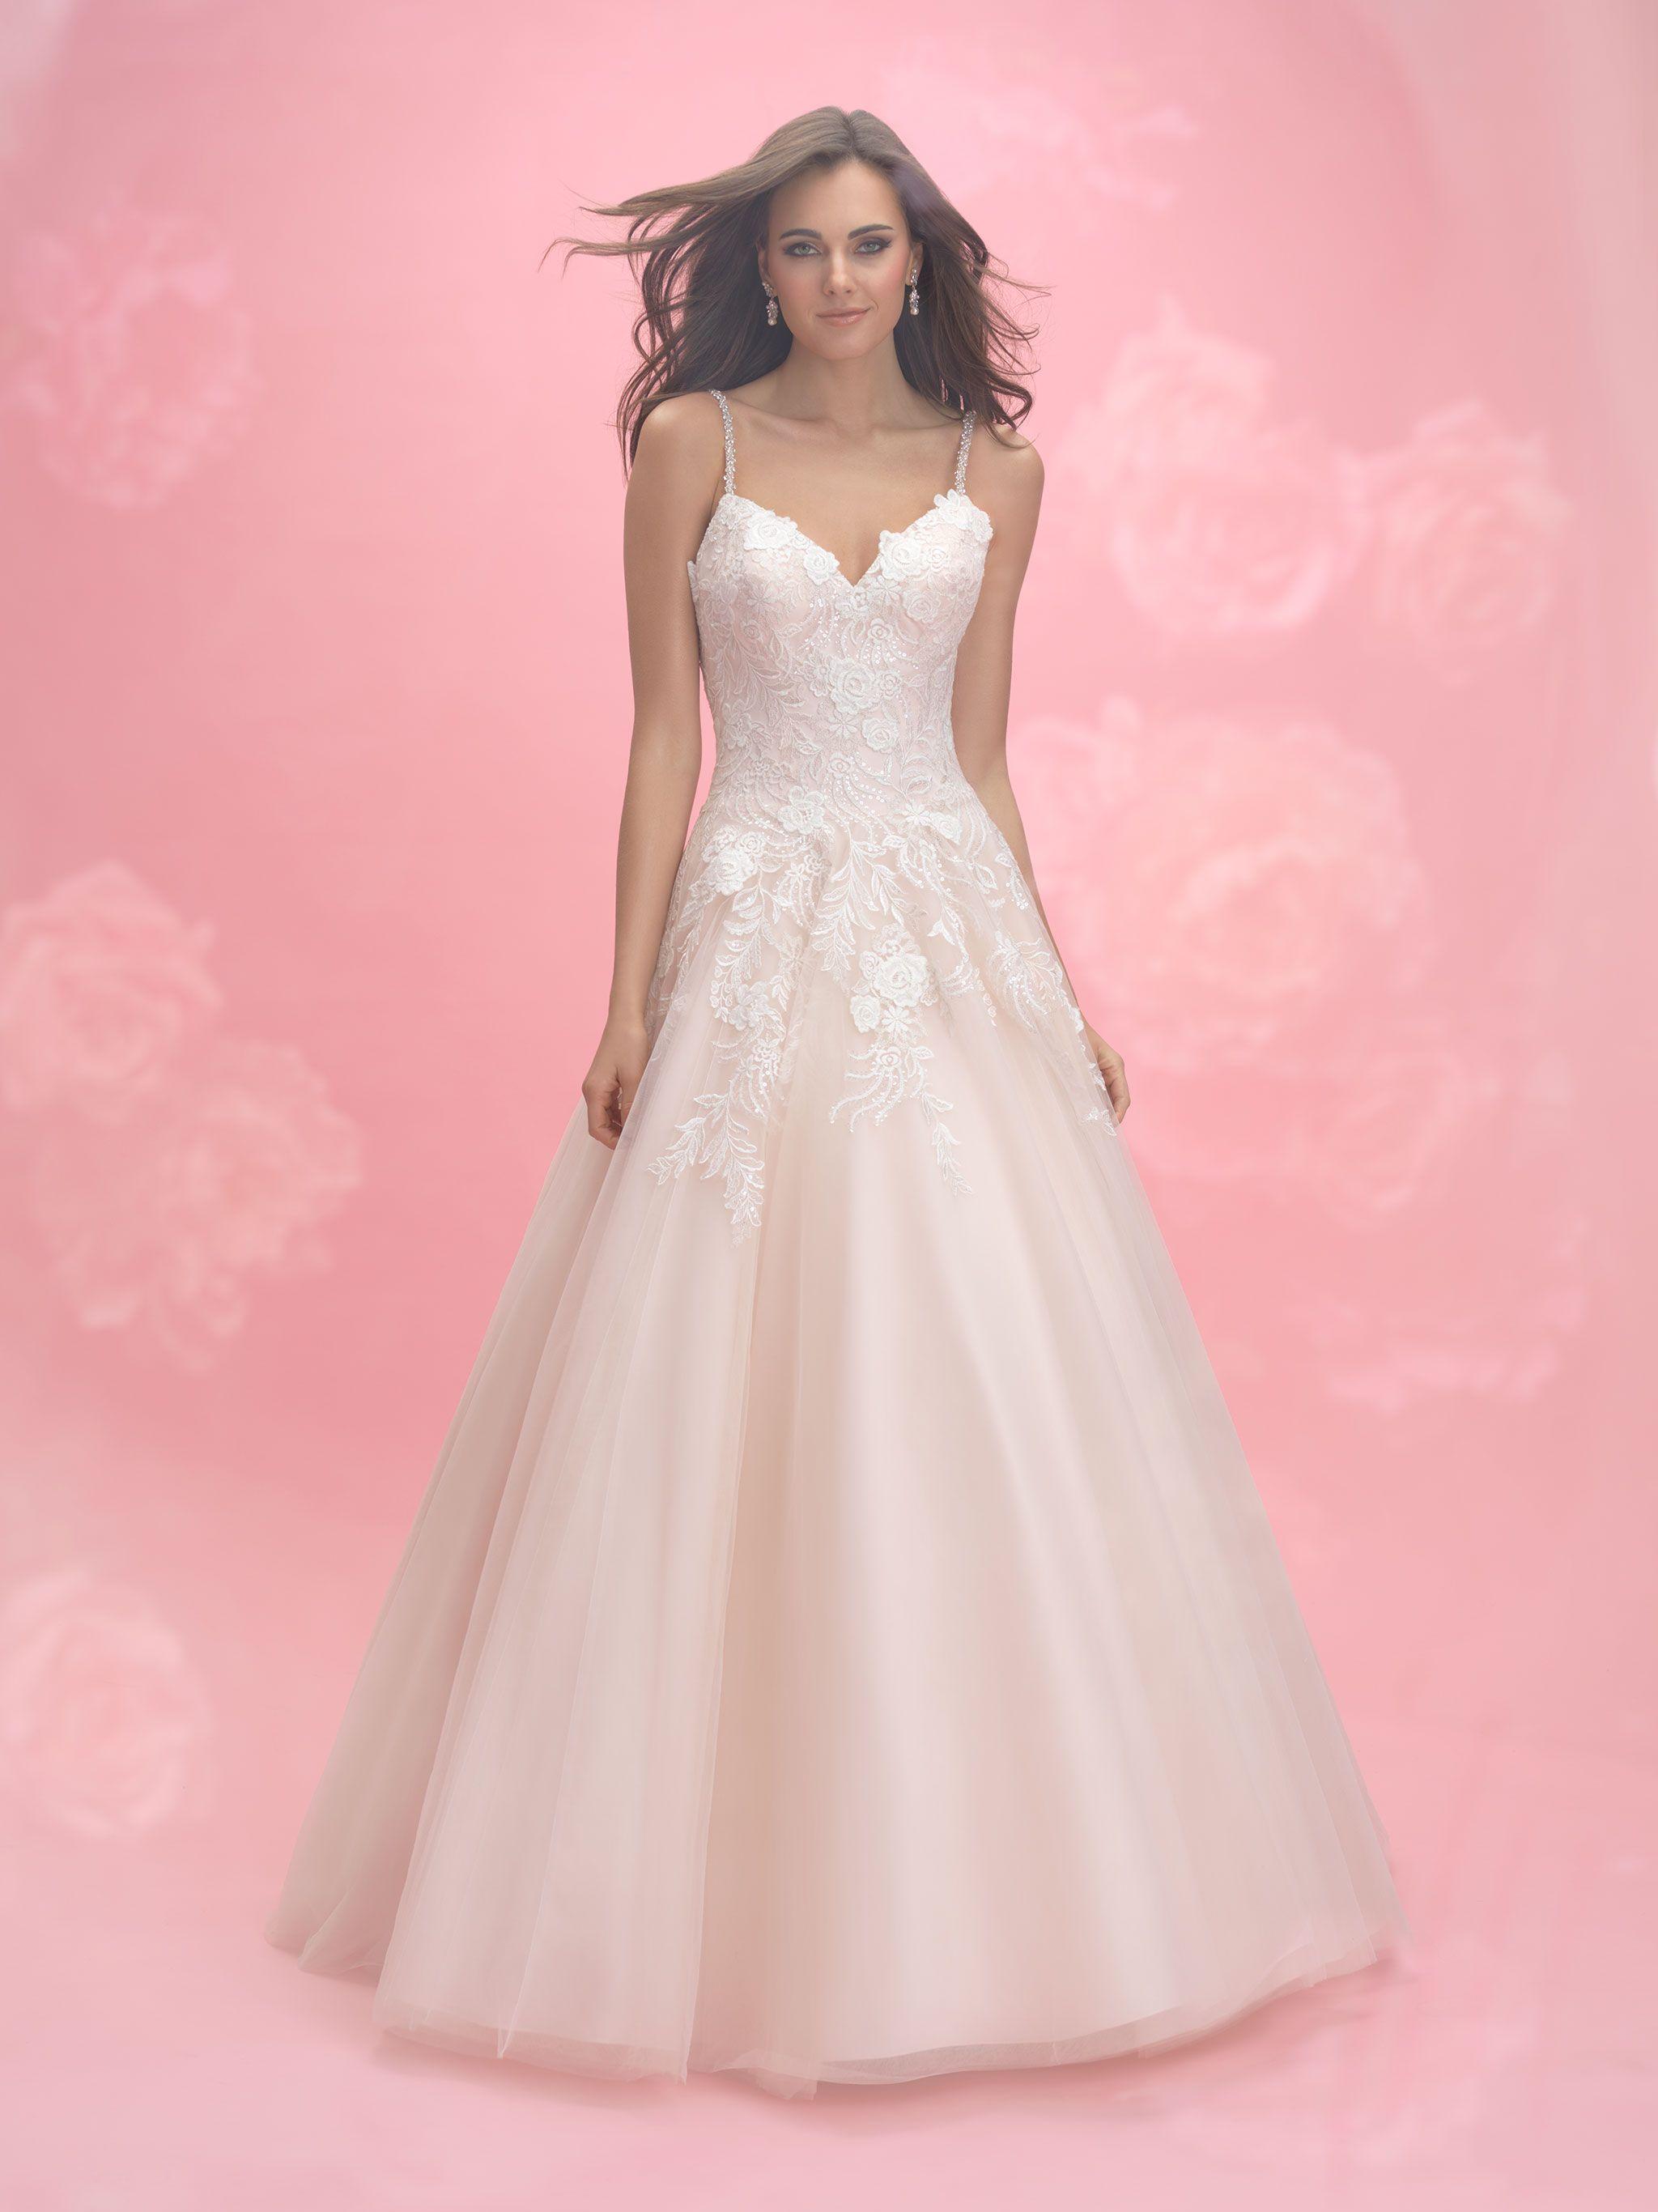 Allure Bridal Wedding Dress. Find Allure Bridal and More at Bridal ...